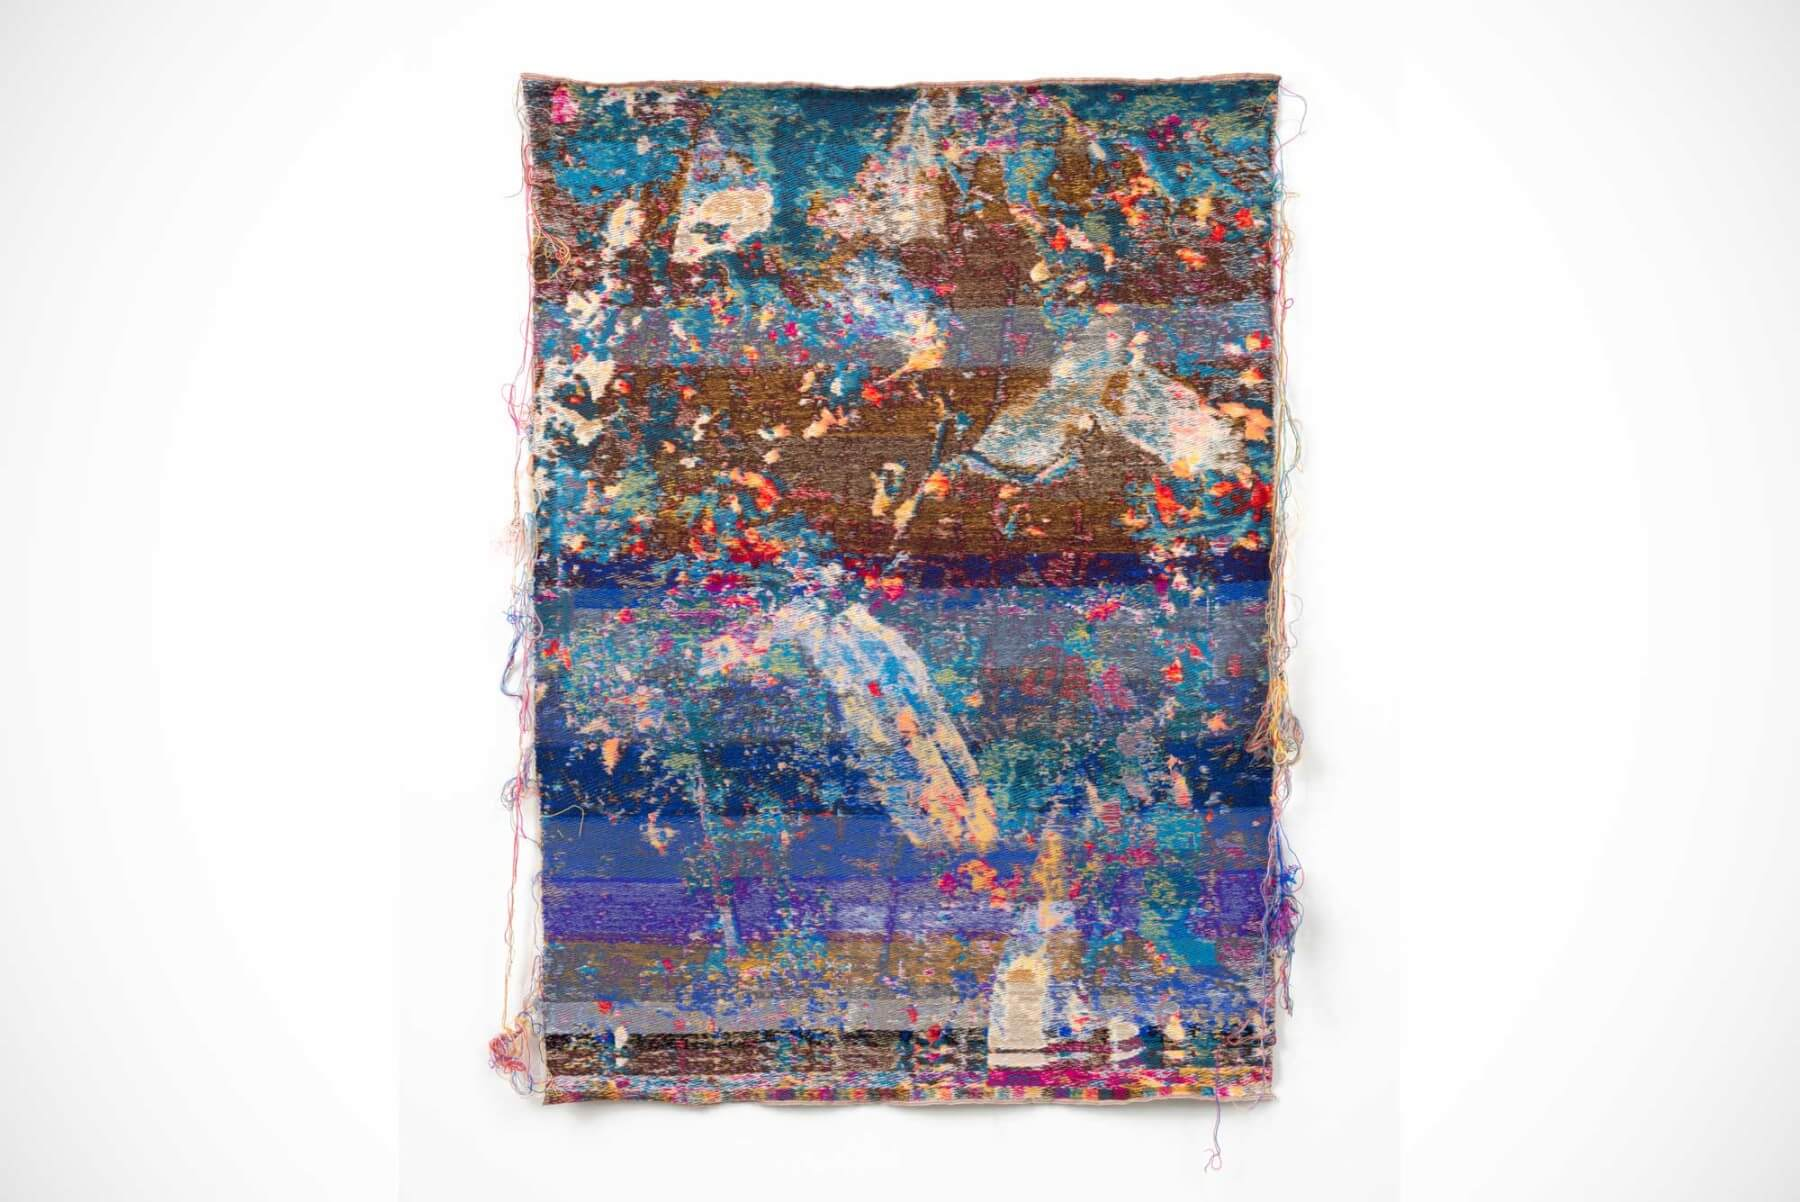 Laura Letinsky & John Paul Morabito |                              WordflowersphloraisAurHottir - wall tapestry